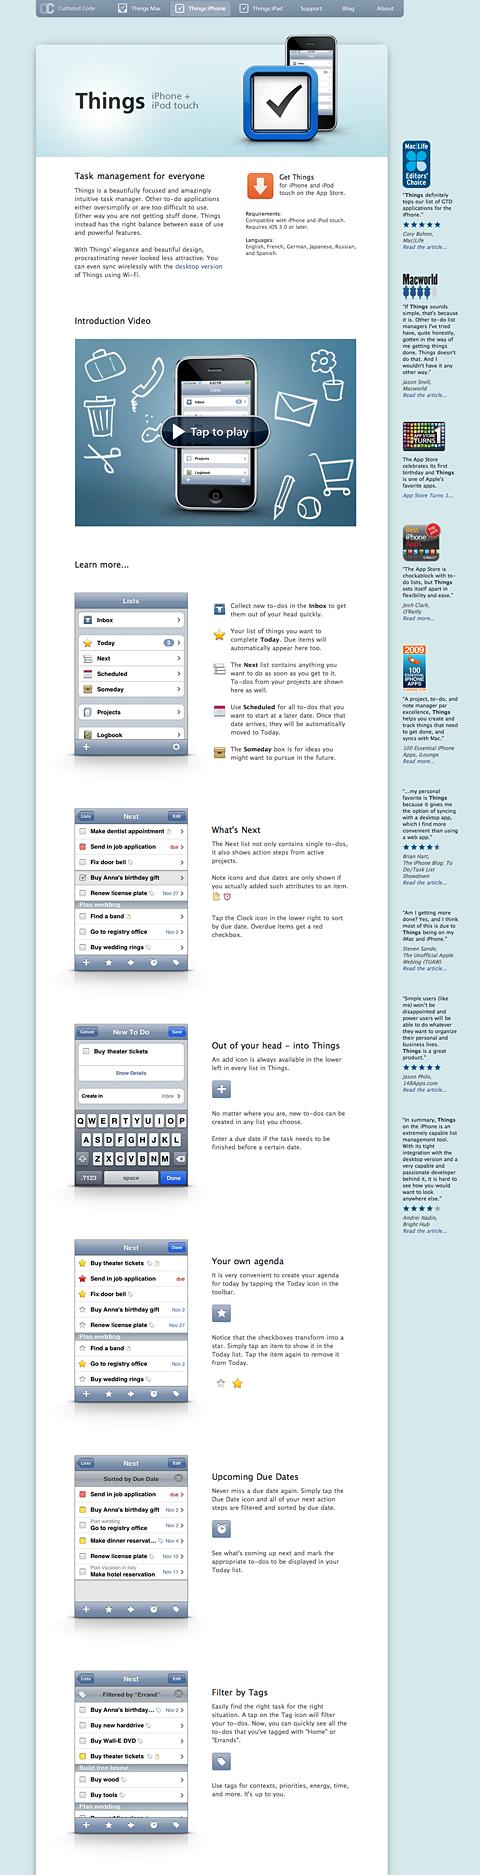 Landingpage iPhone App Things